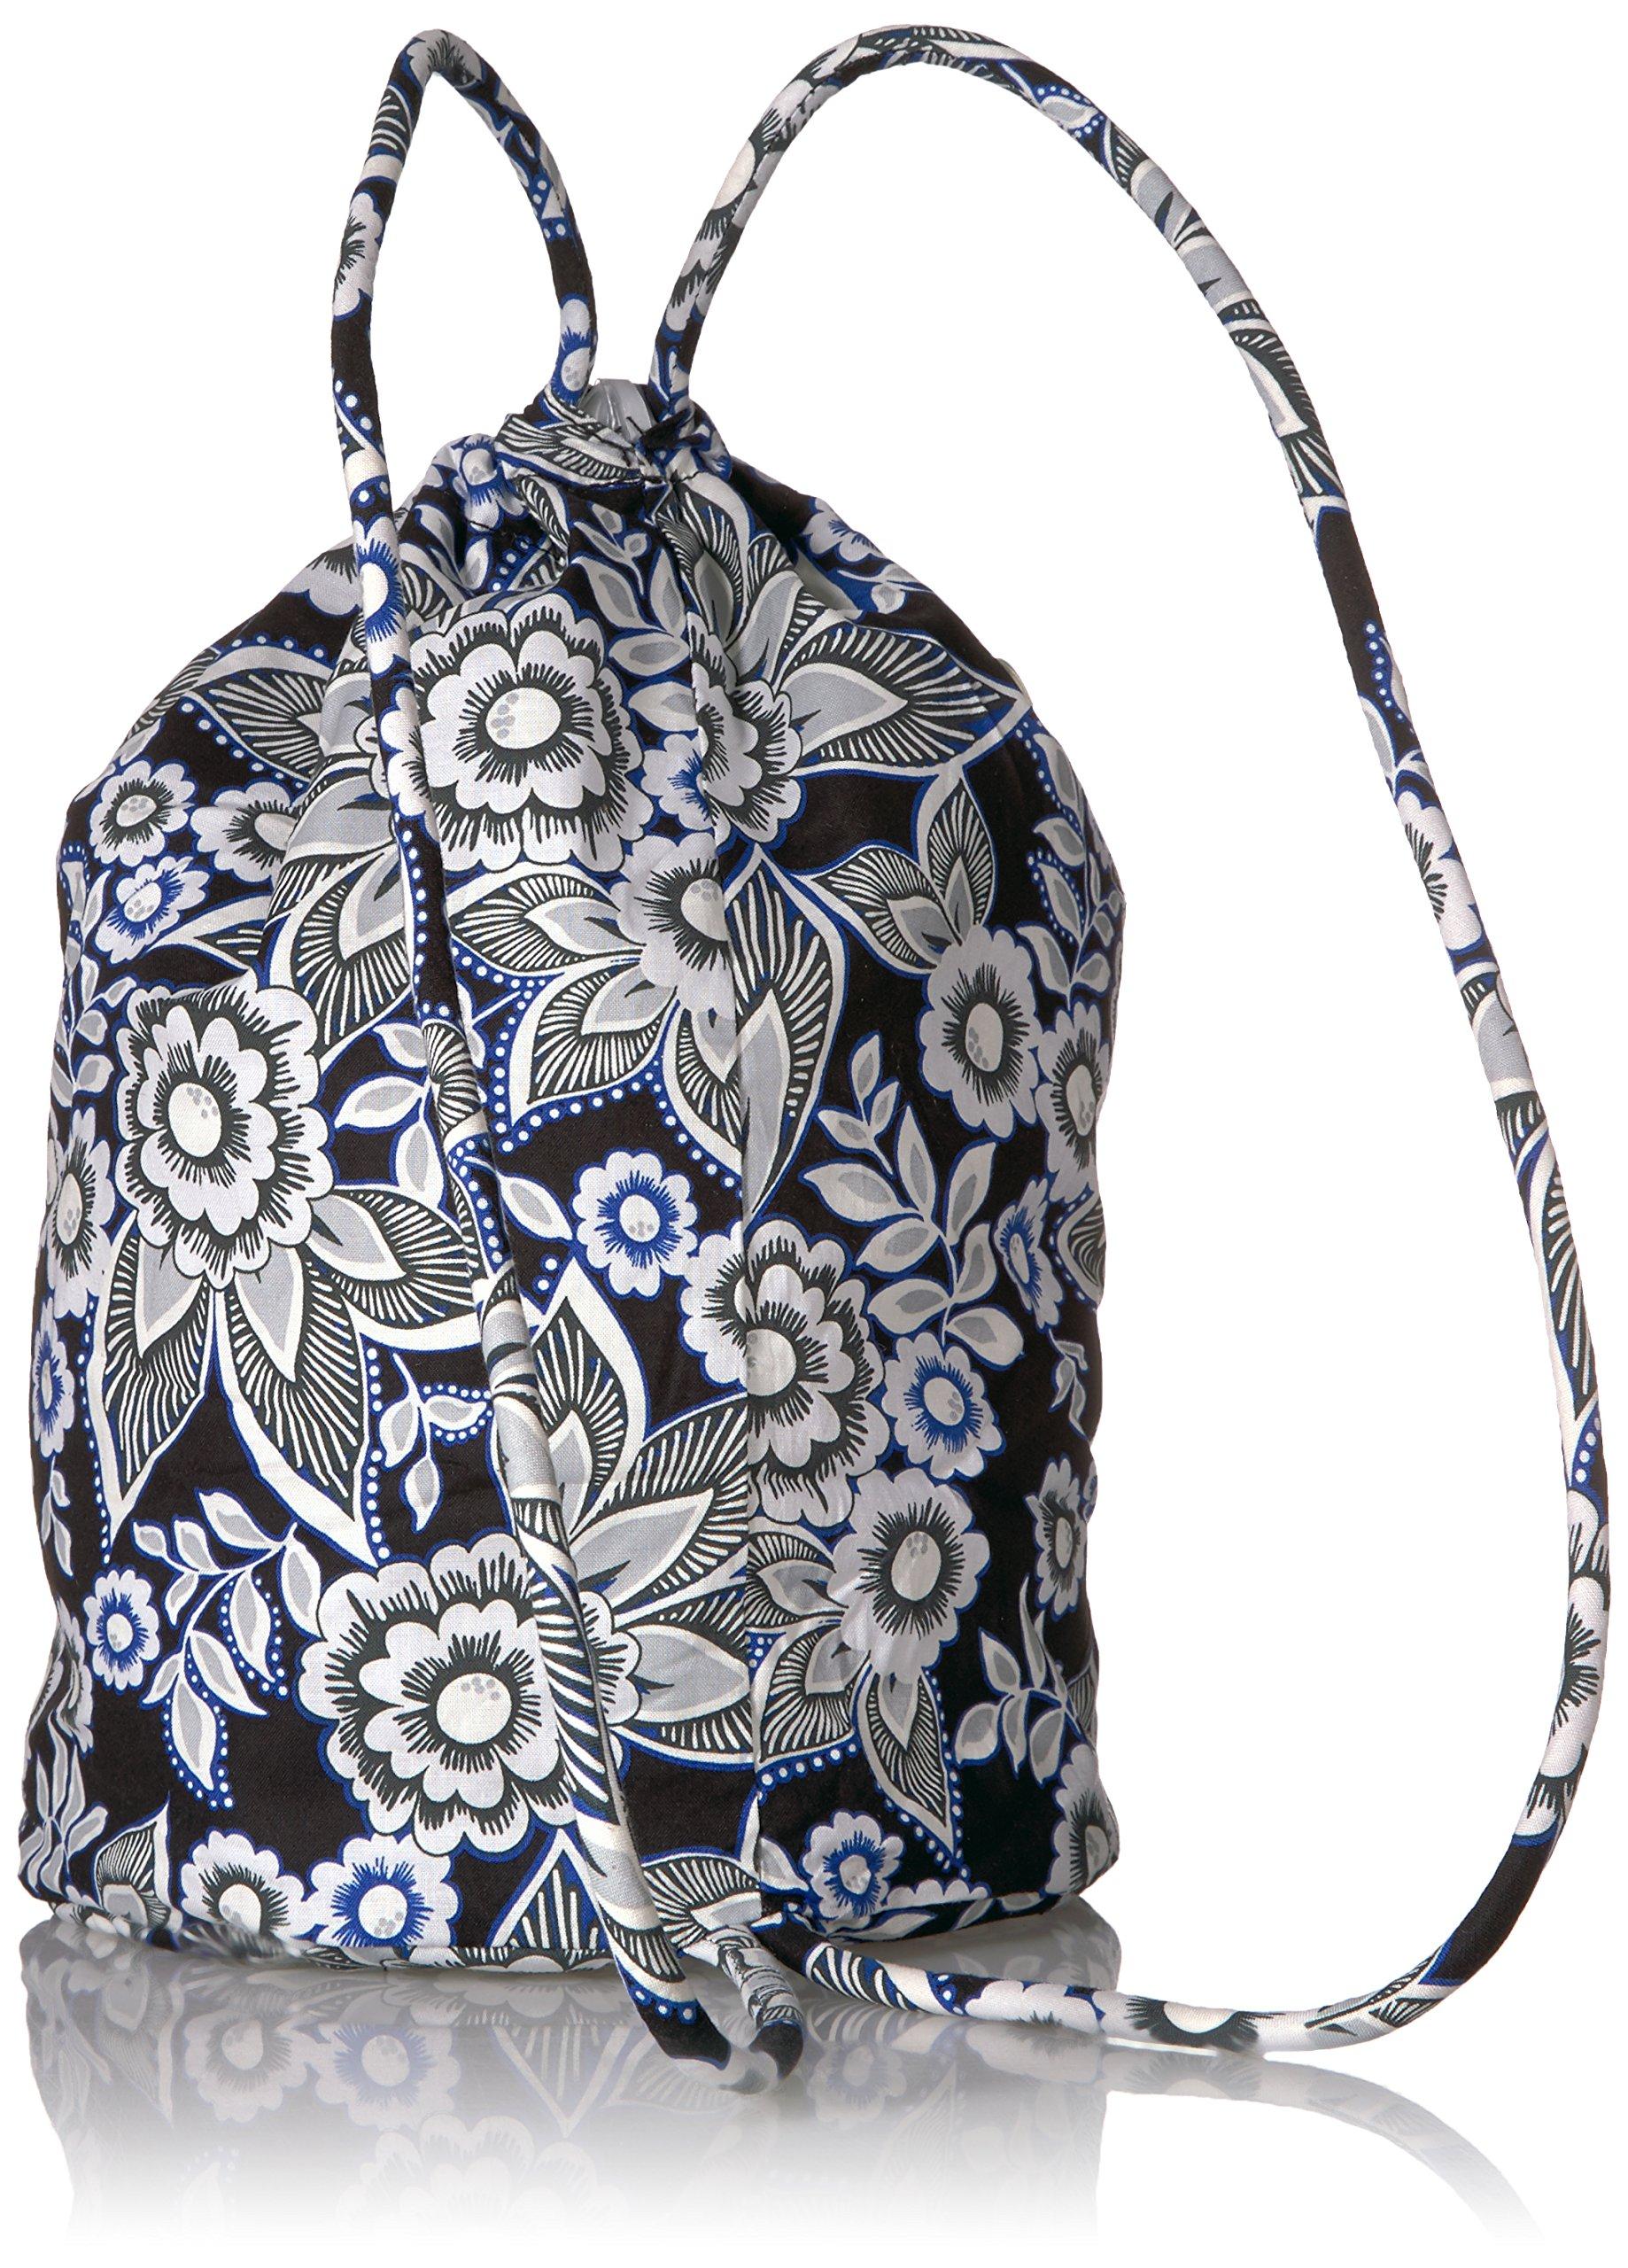 Vera Bradley Iconic Ditty Bag-Signature by Vera Bradley (Image #2)